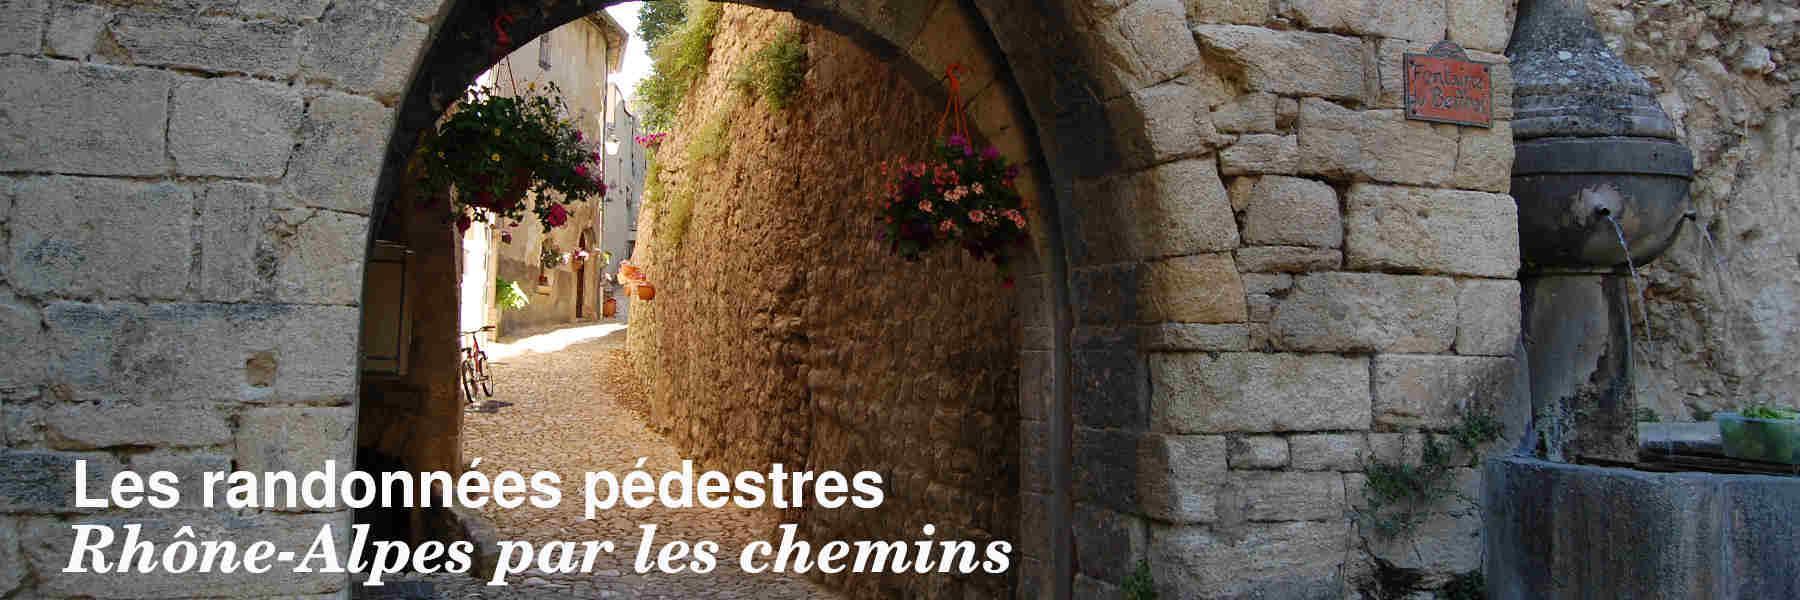 Les randonnées pédestres en Rhône-Alpes